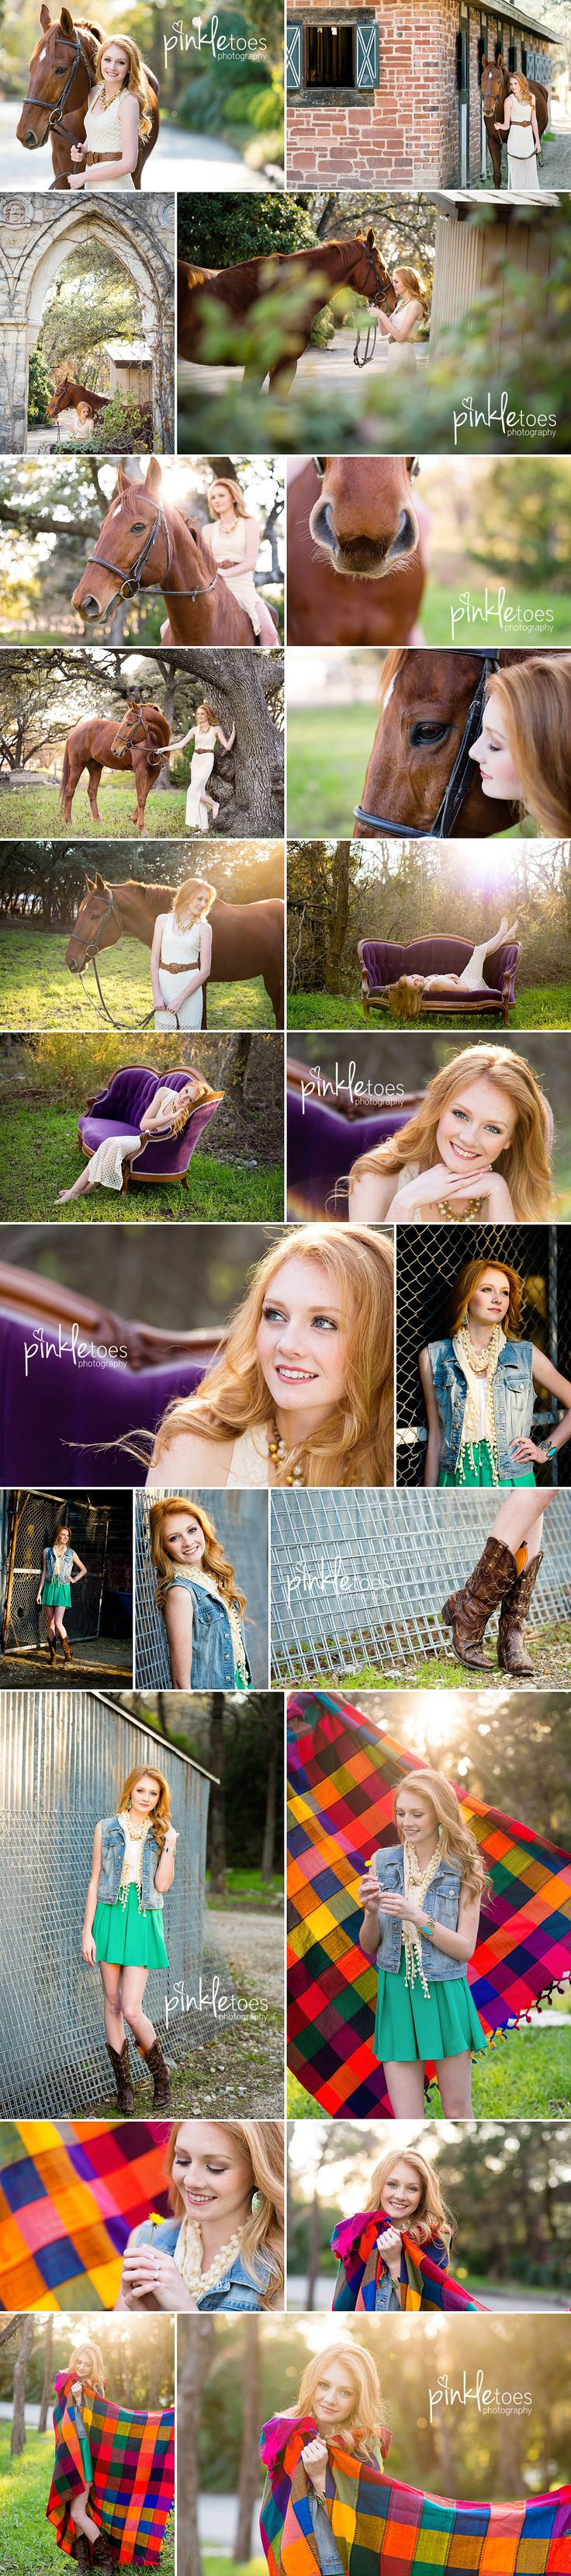 kw-austin-senior-portraits-horse-velvet-couch-colorful-natural-vibrant-high-school-b